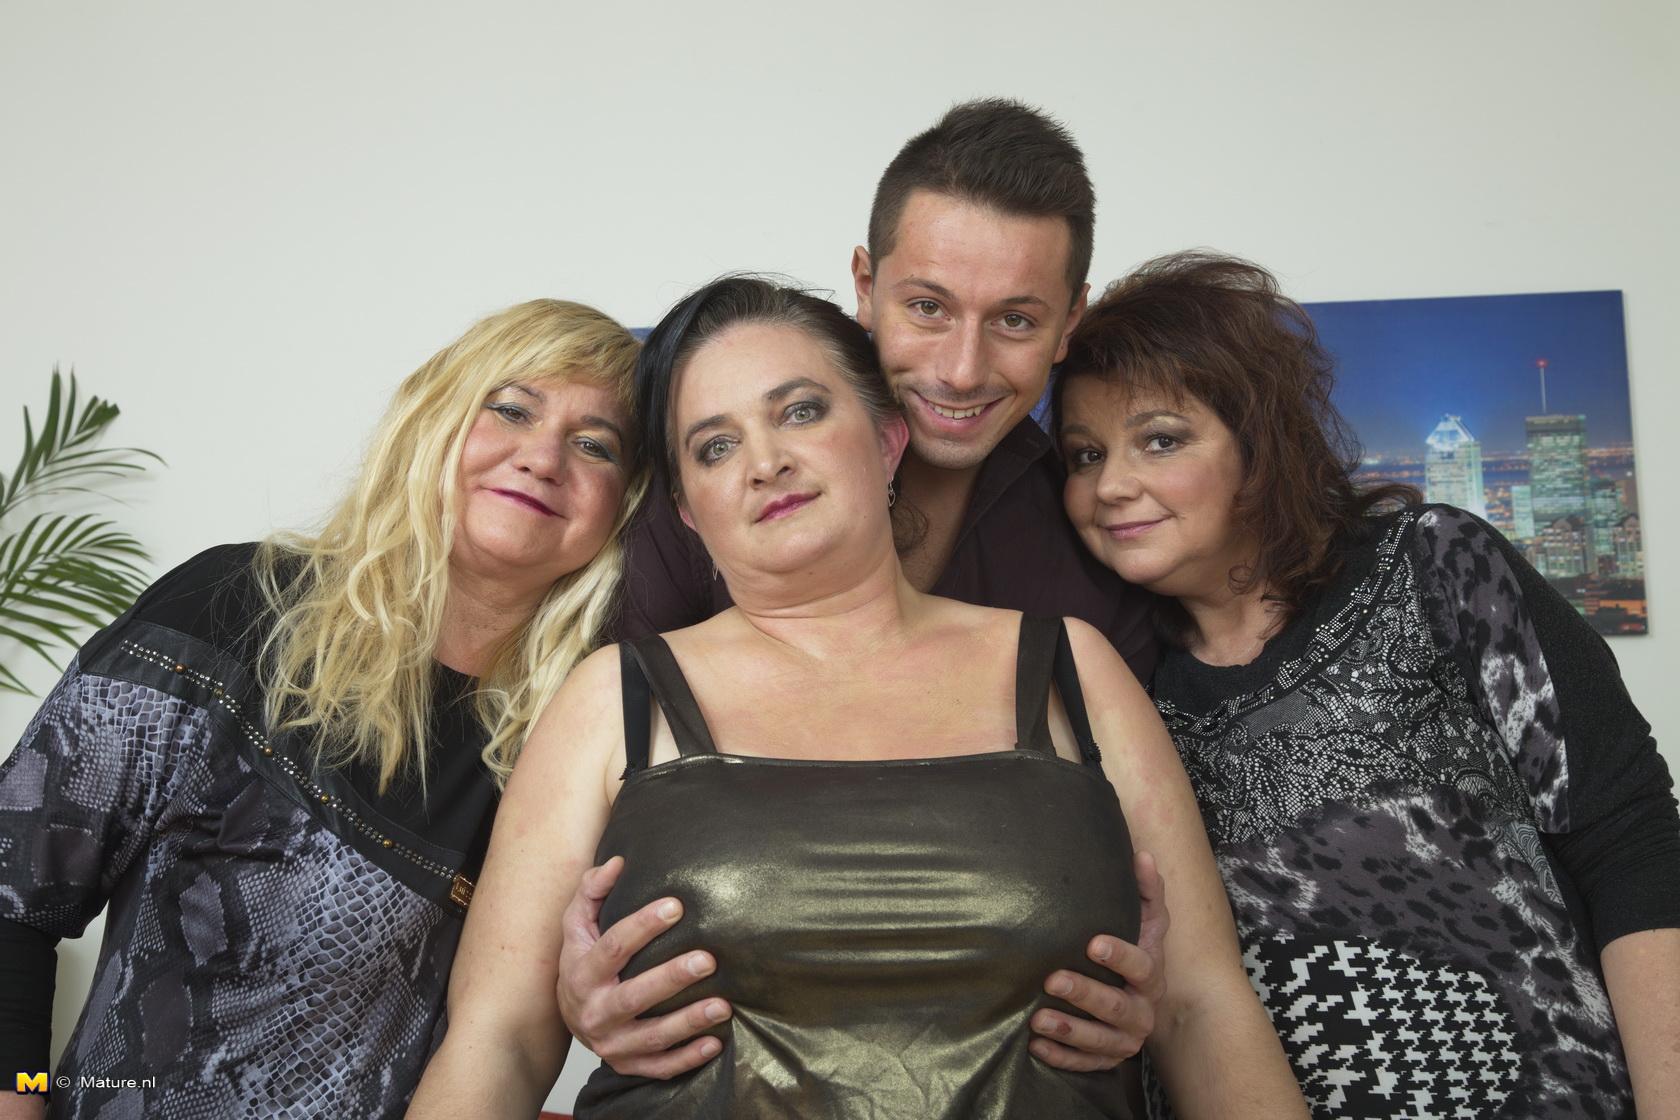 threesome Amateur shared bbw granny